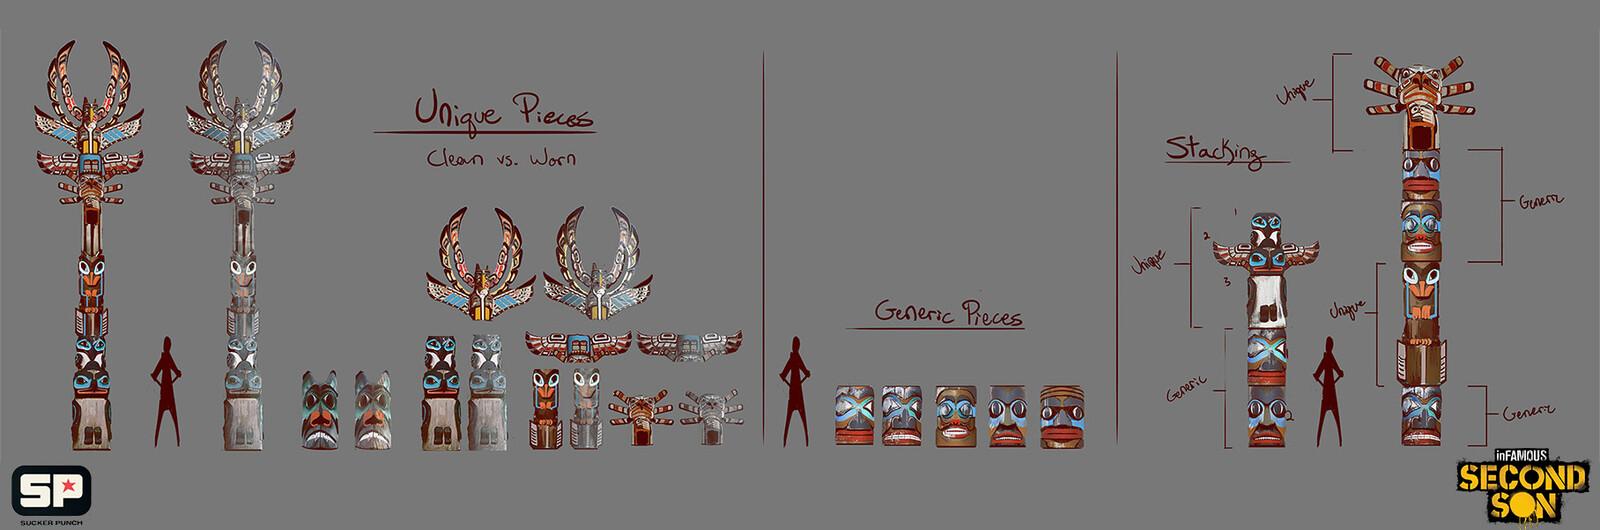 Potential totem pole concepts